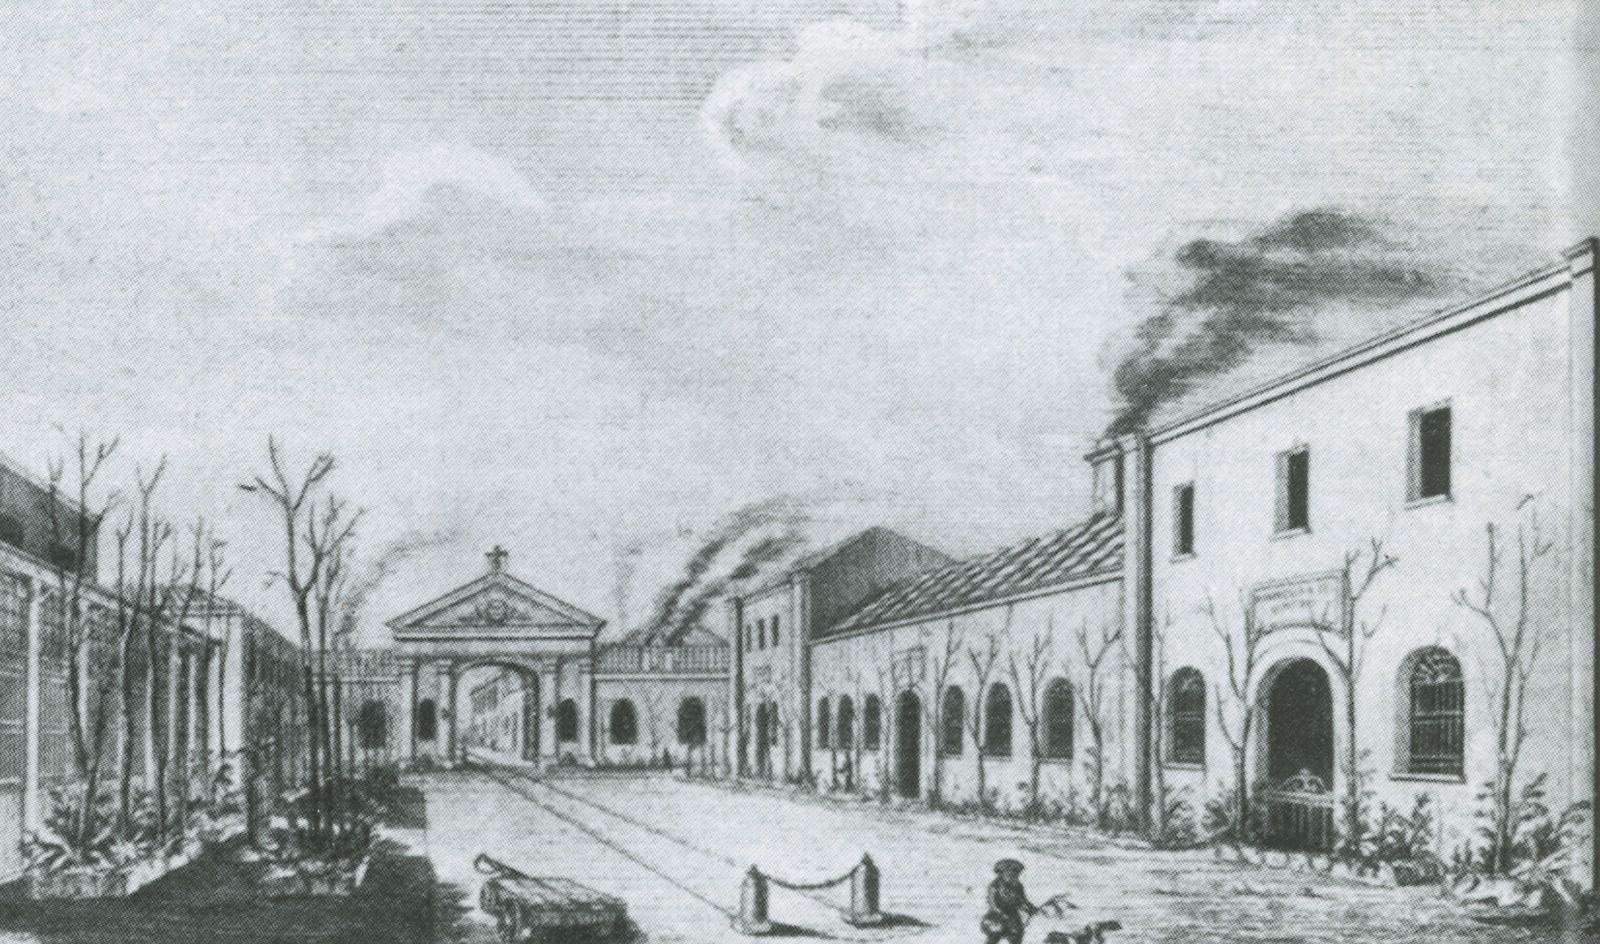 Pietrarsa, Officina locomotive